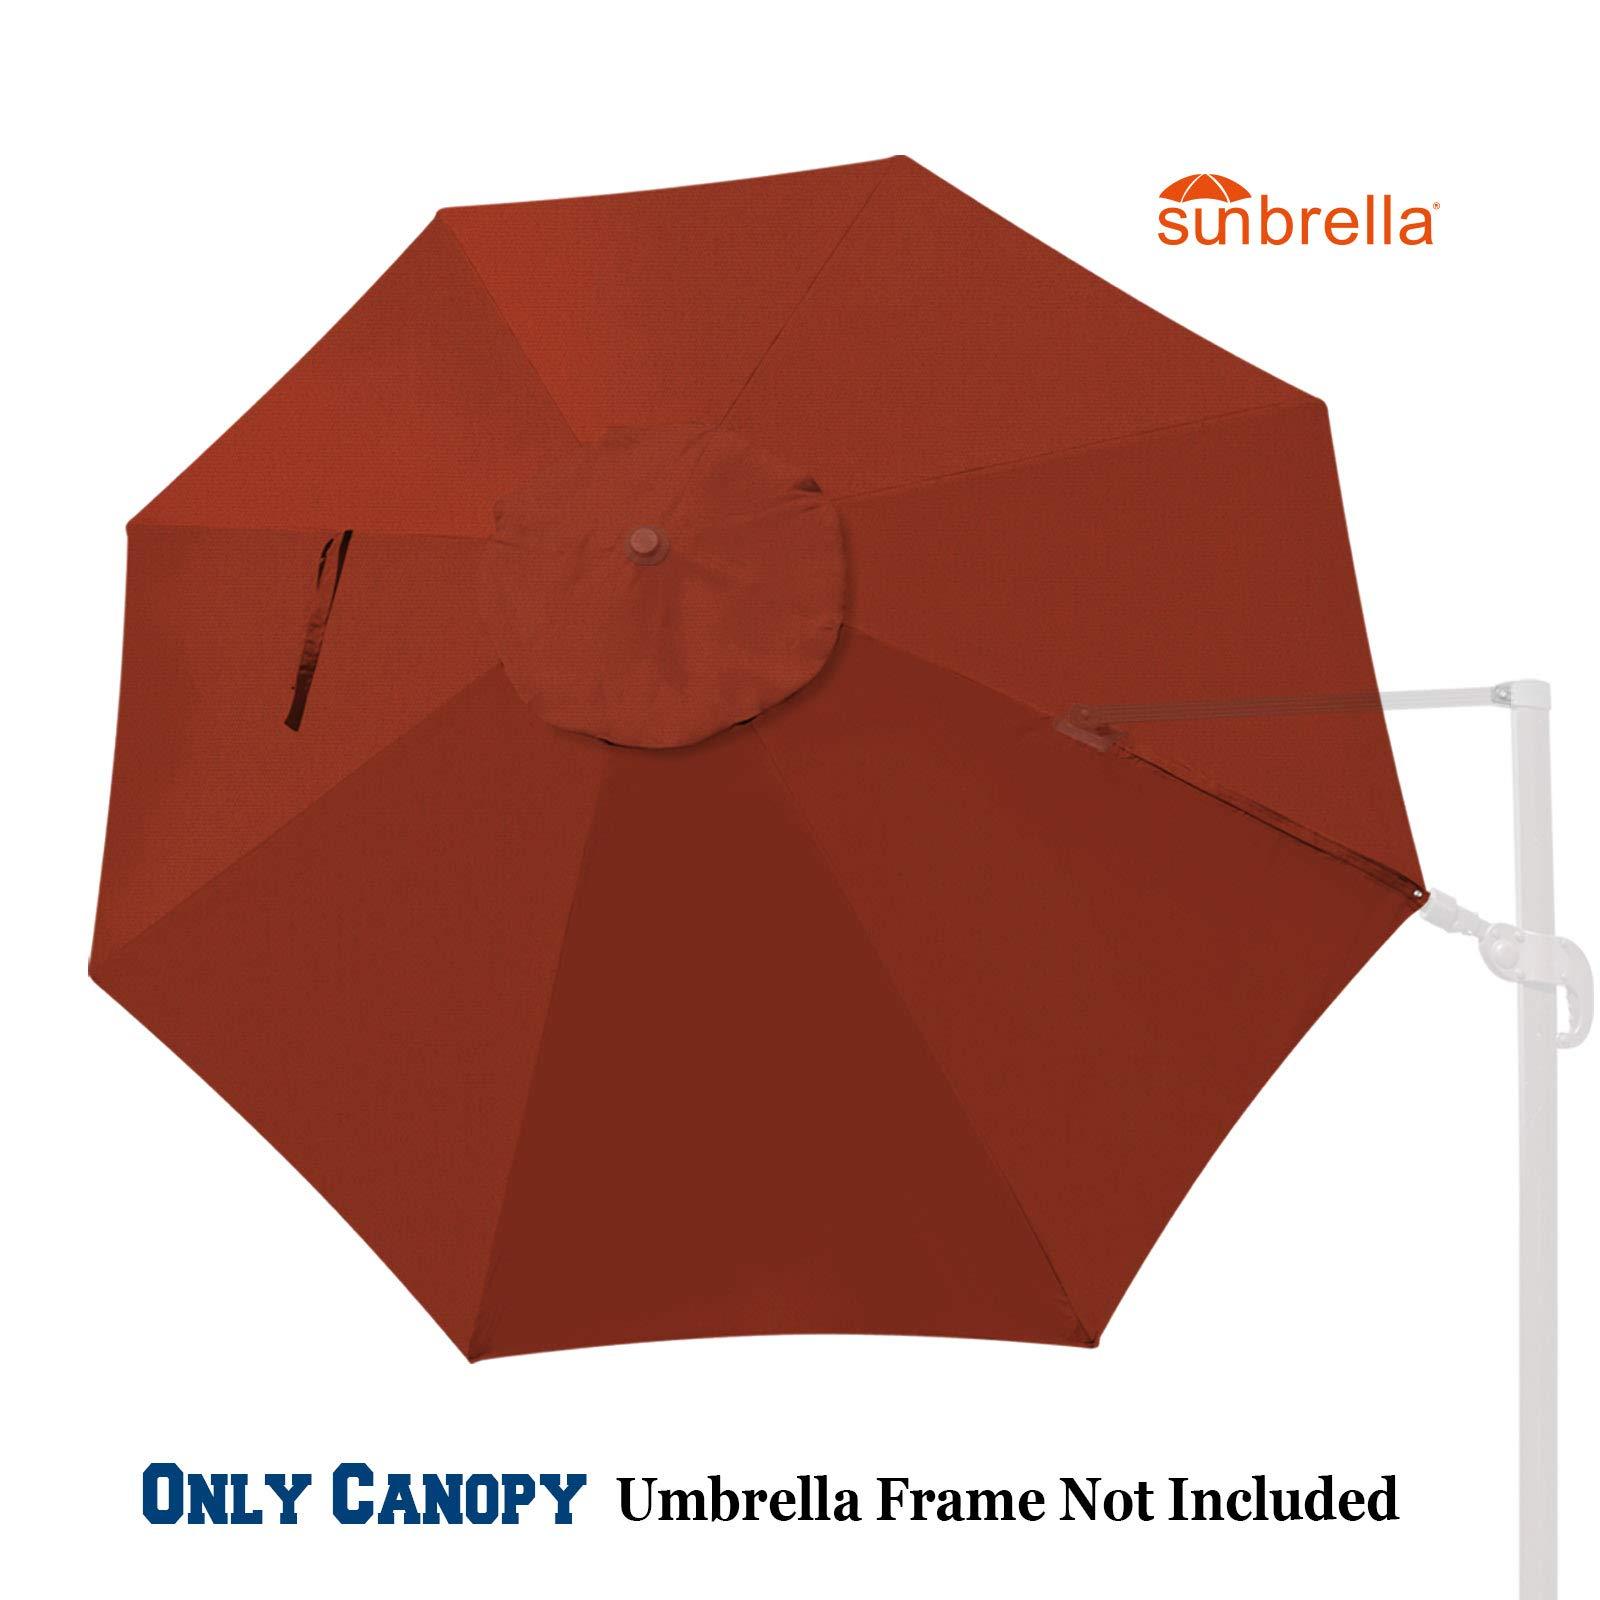 BenefitUSA Replacement Canopy for 11.5ft 8 Ribs Rome Cantilever Patio Umbrella Parasol Top Sunbrella Cover (Henna)